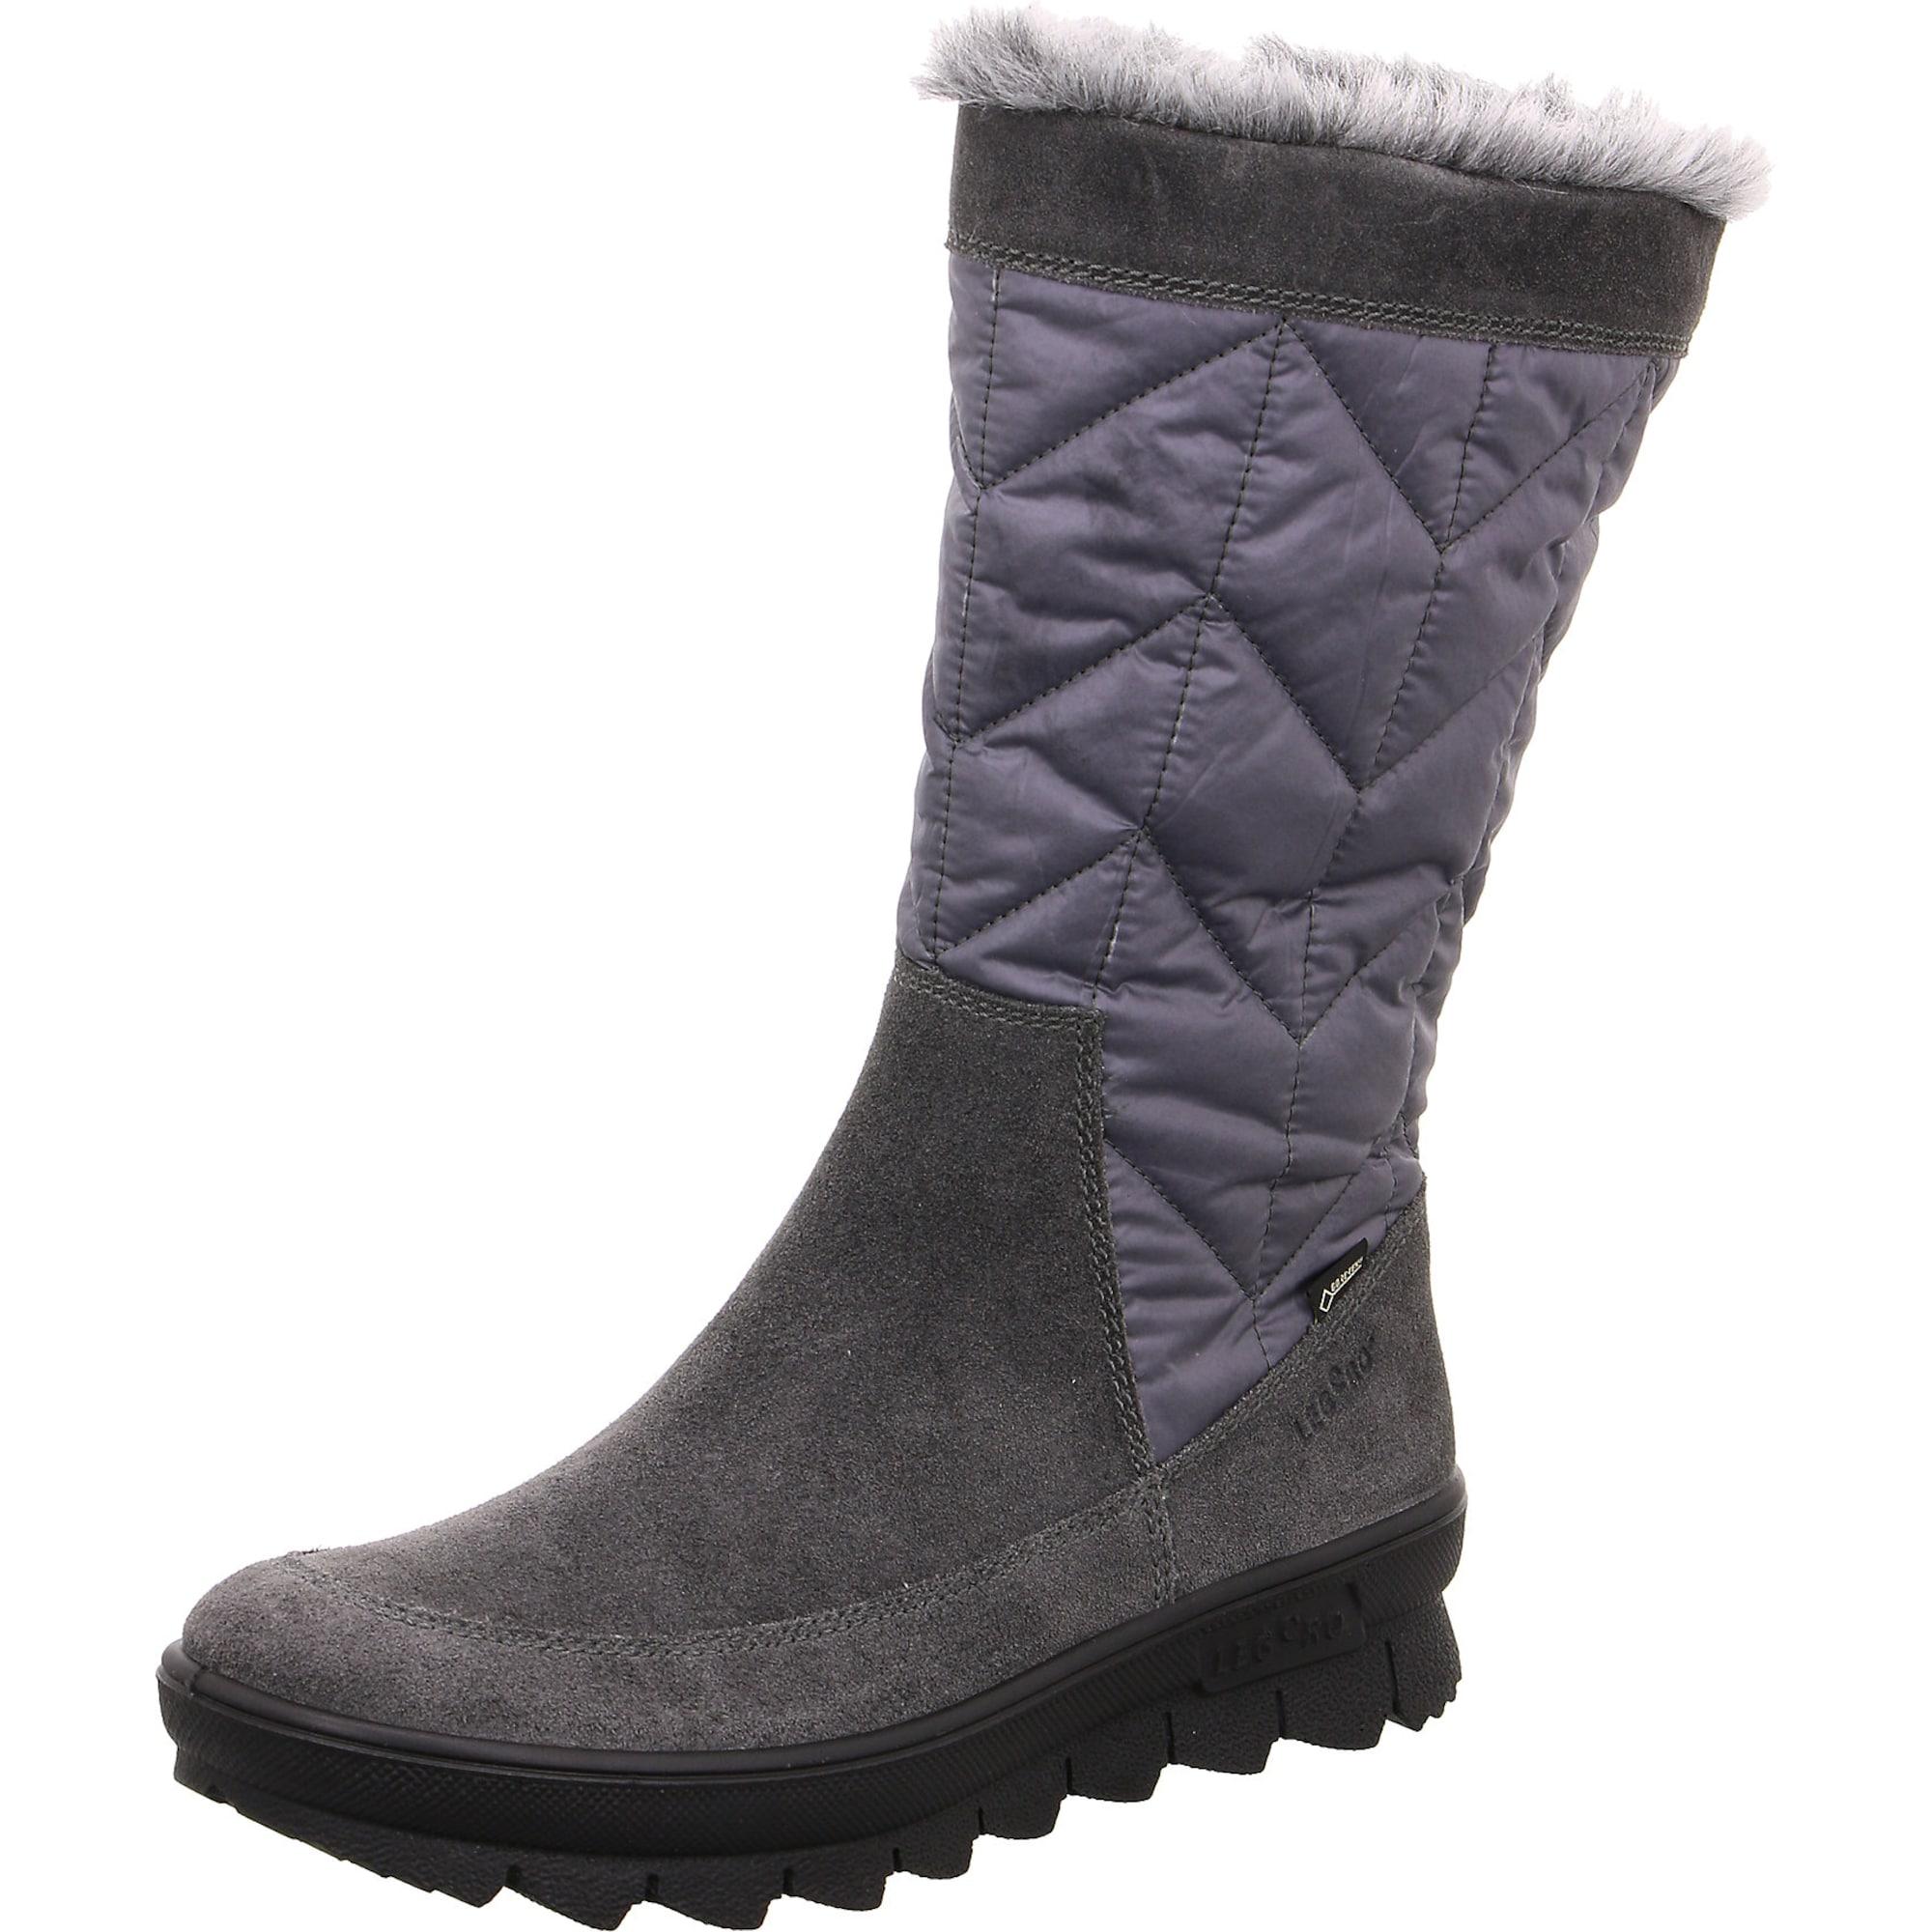 Winterstiefel 'NOVARA' | Schuhe > Stiefel > Winterstiefel | Flieder | Legero